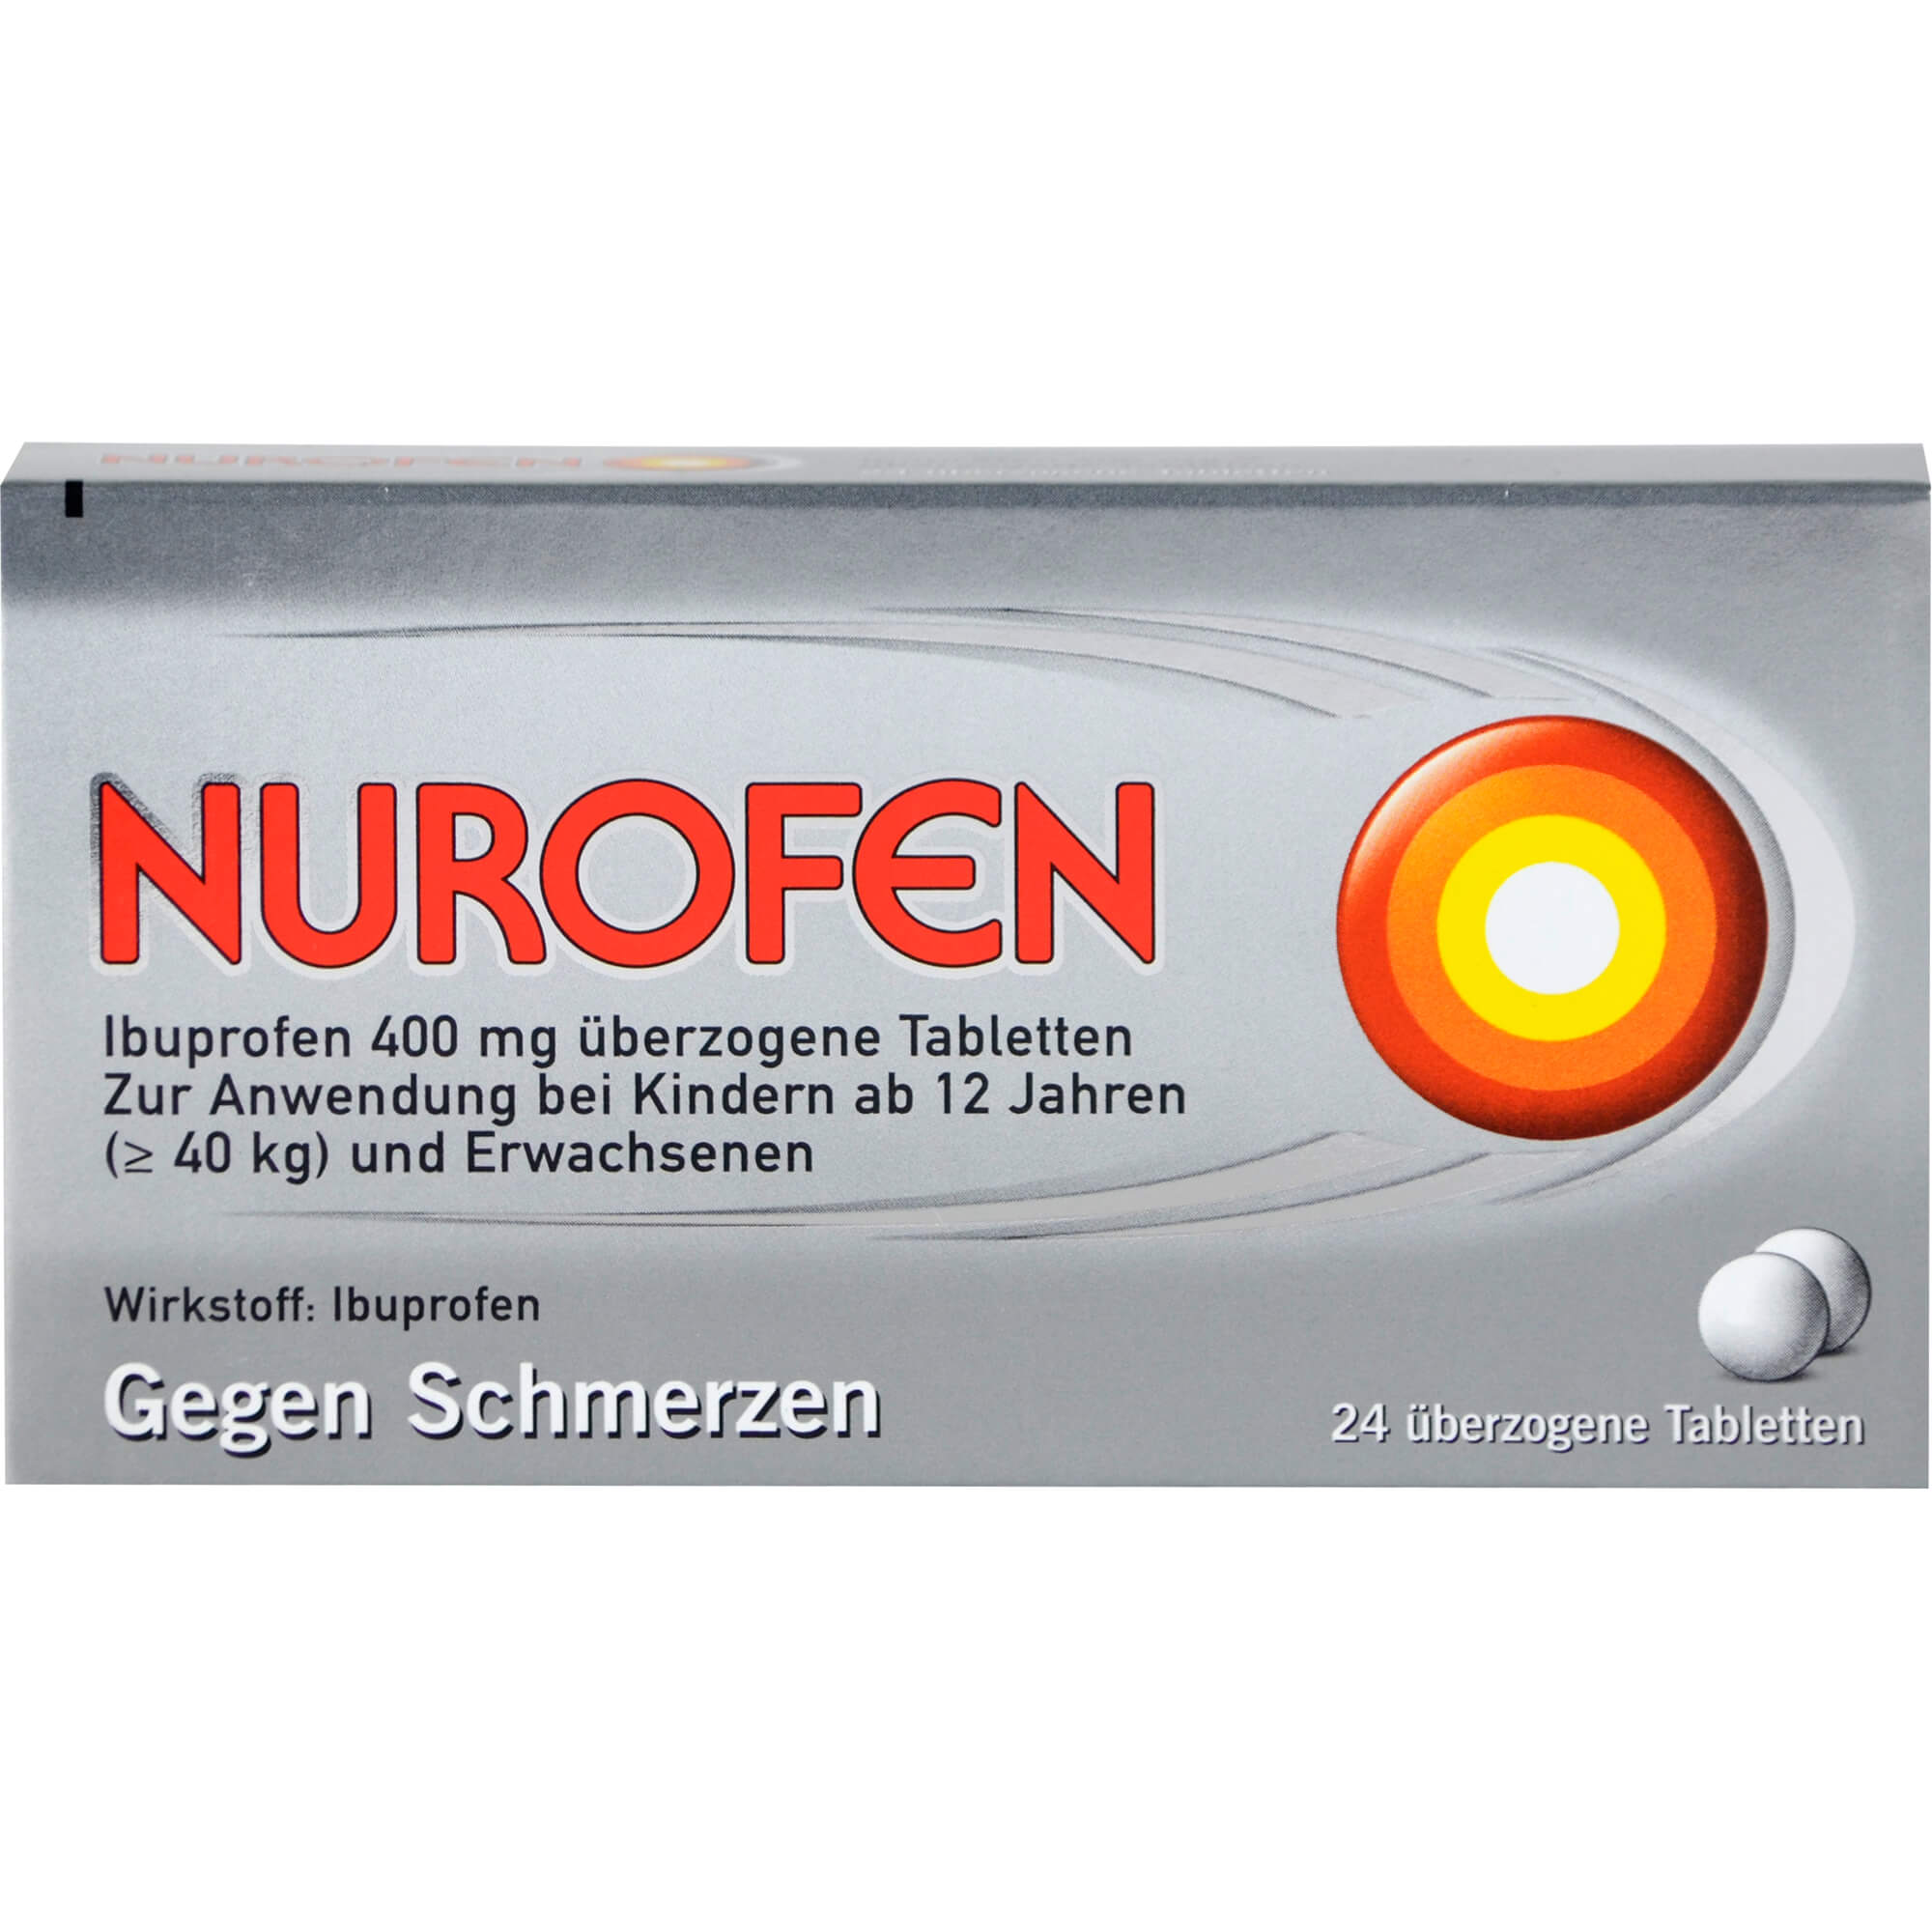 NUROFEN-Ibuprofen-400-mg-ueberzogene-Tabletten